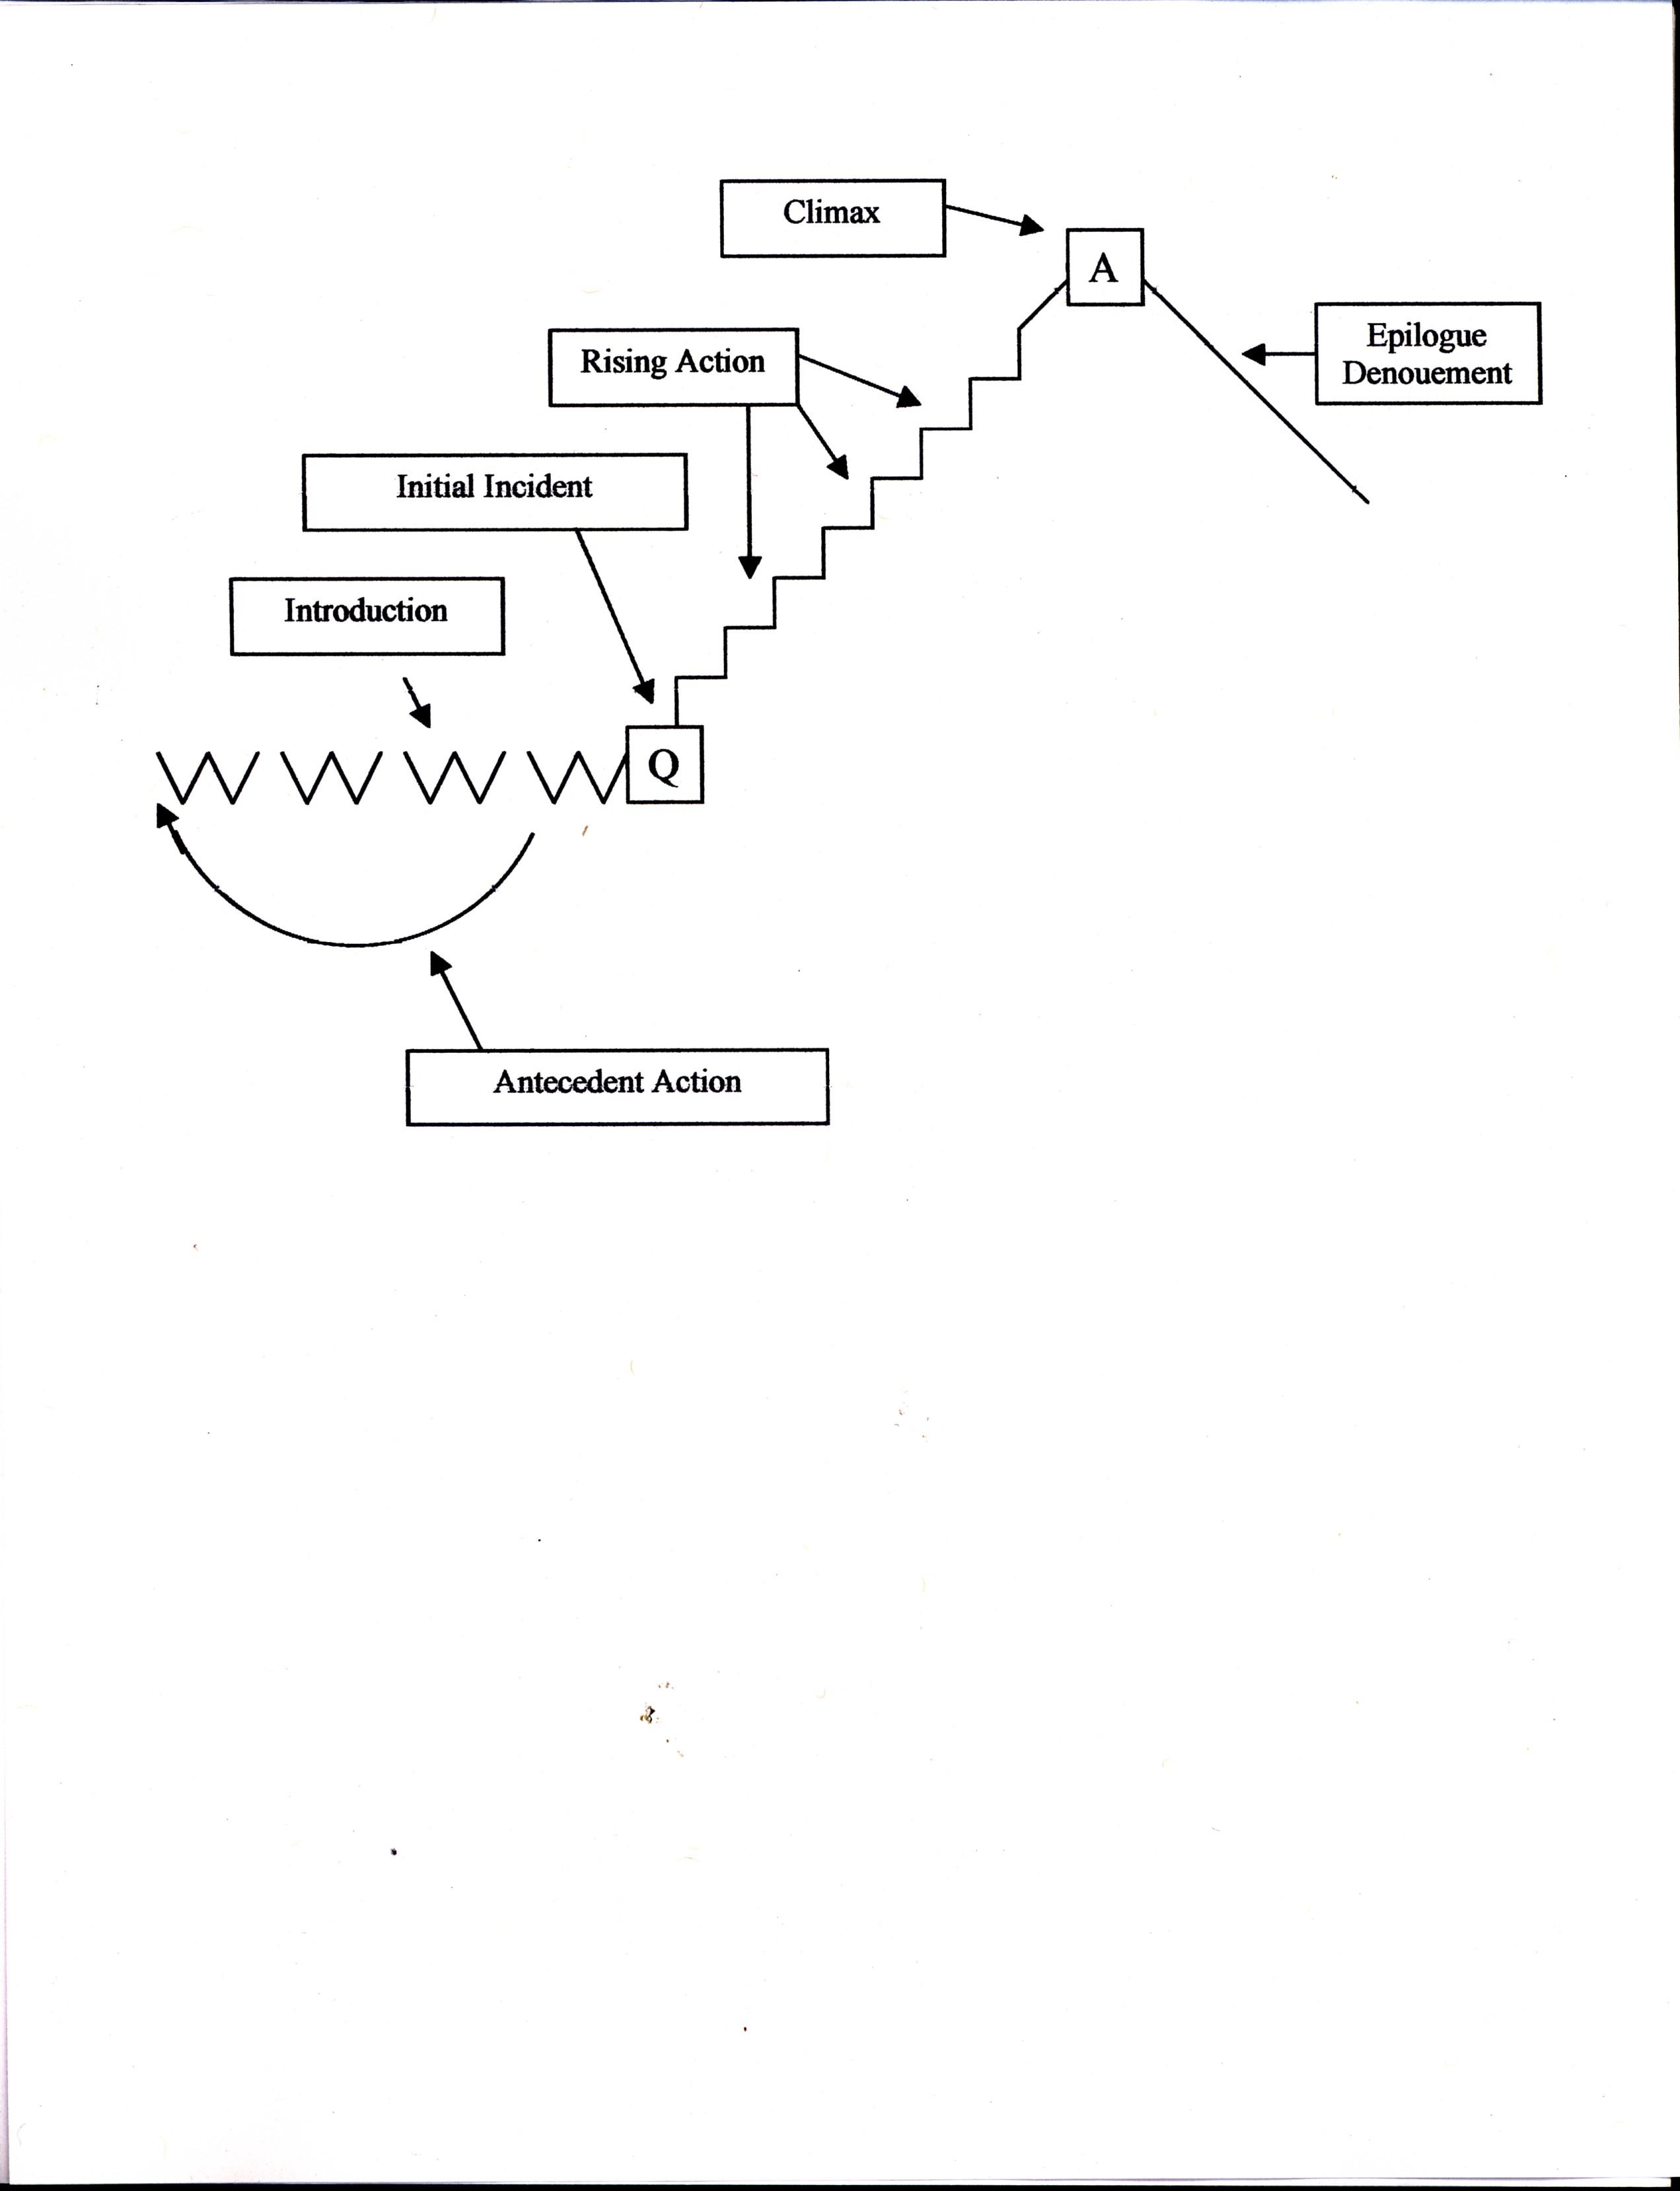 Book report plot diagram stretchfact book report plot diagram pooptronica Choice Image